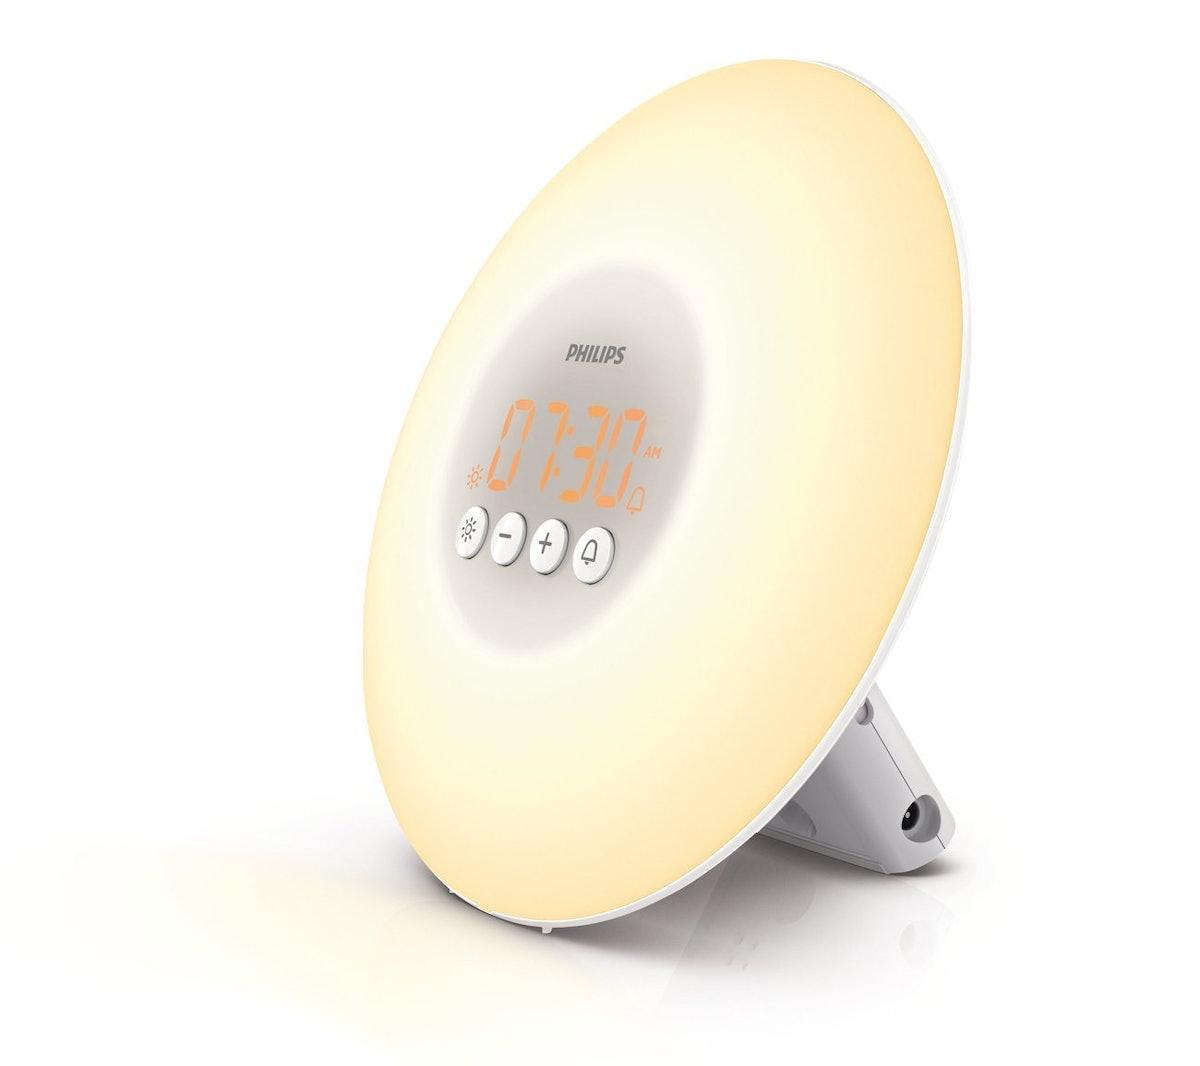 Philips Wake-Up Light Alarm Clock